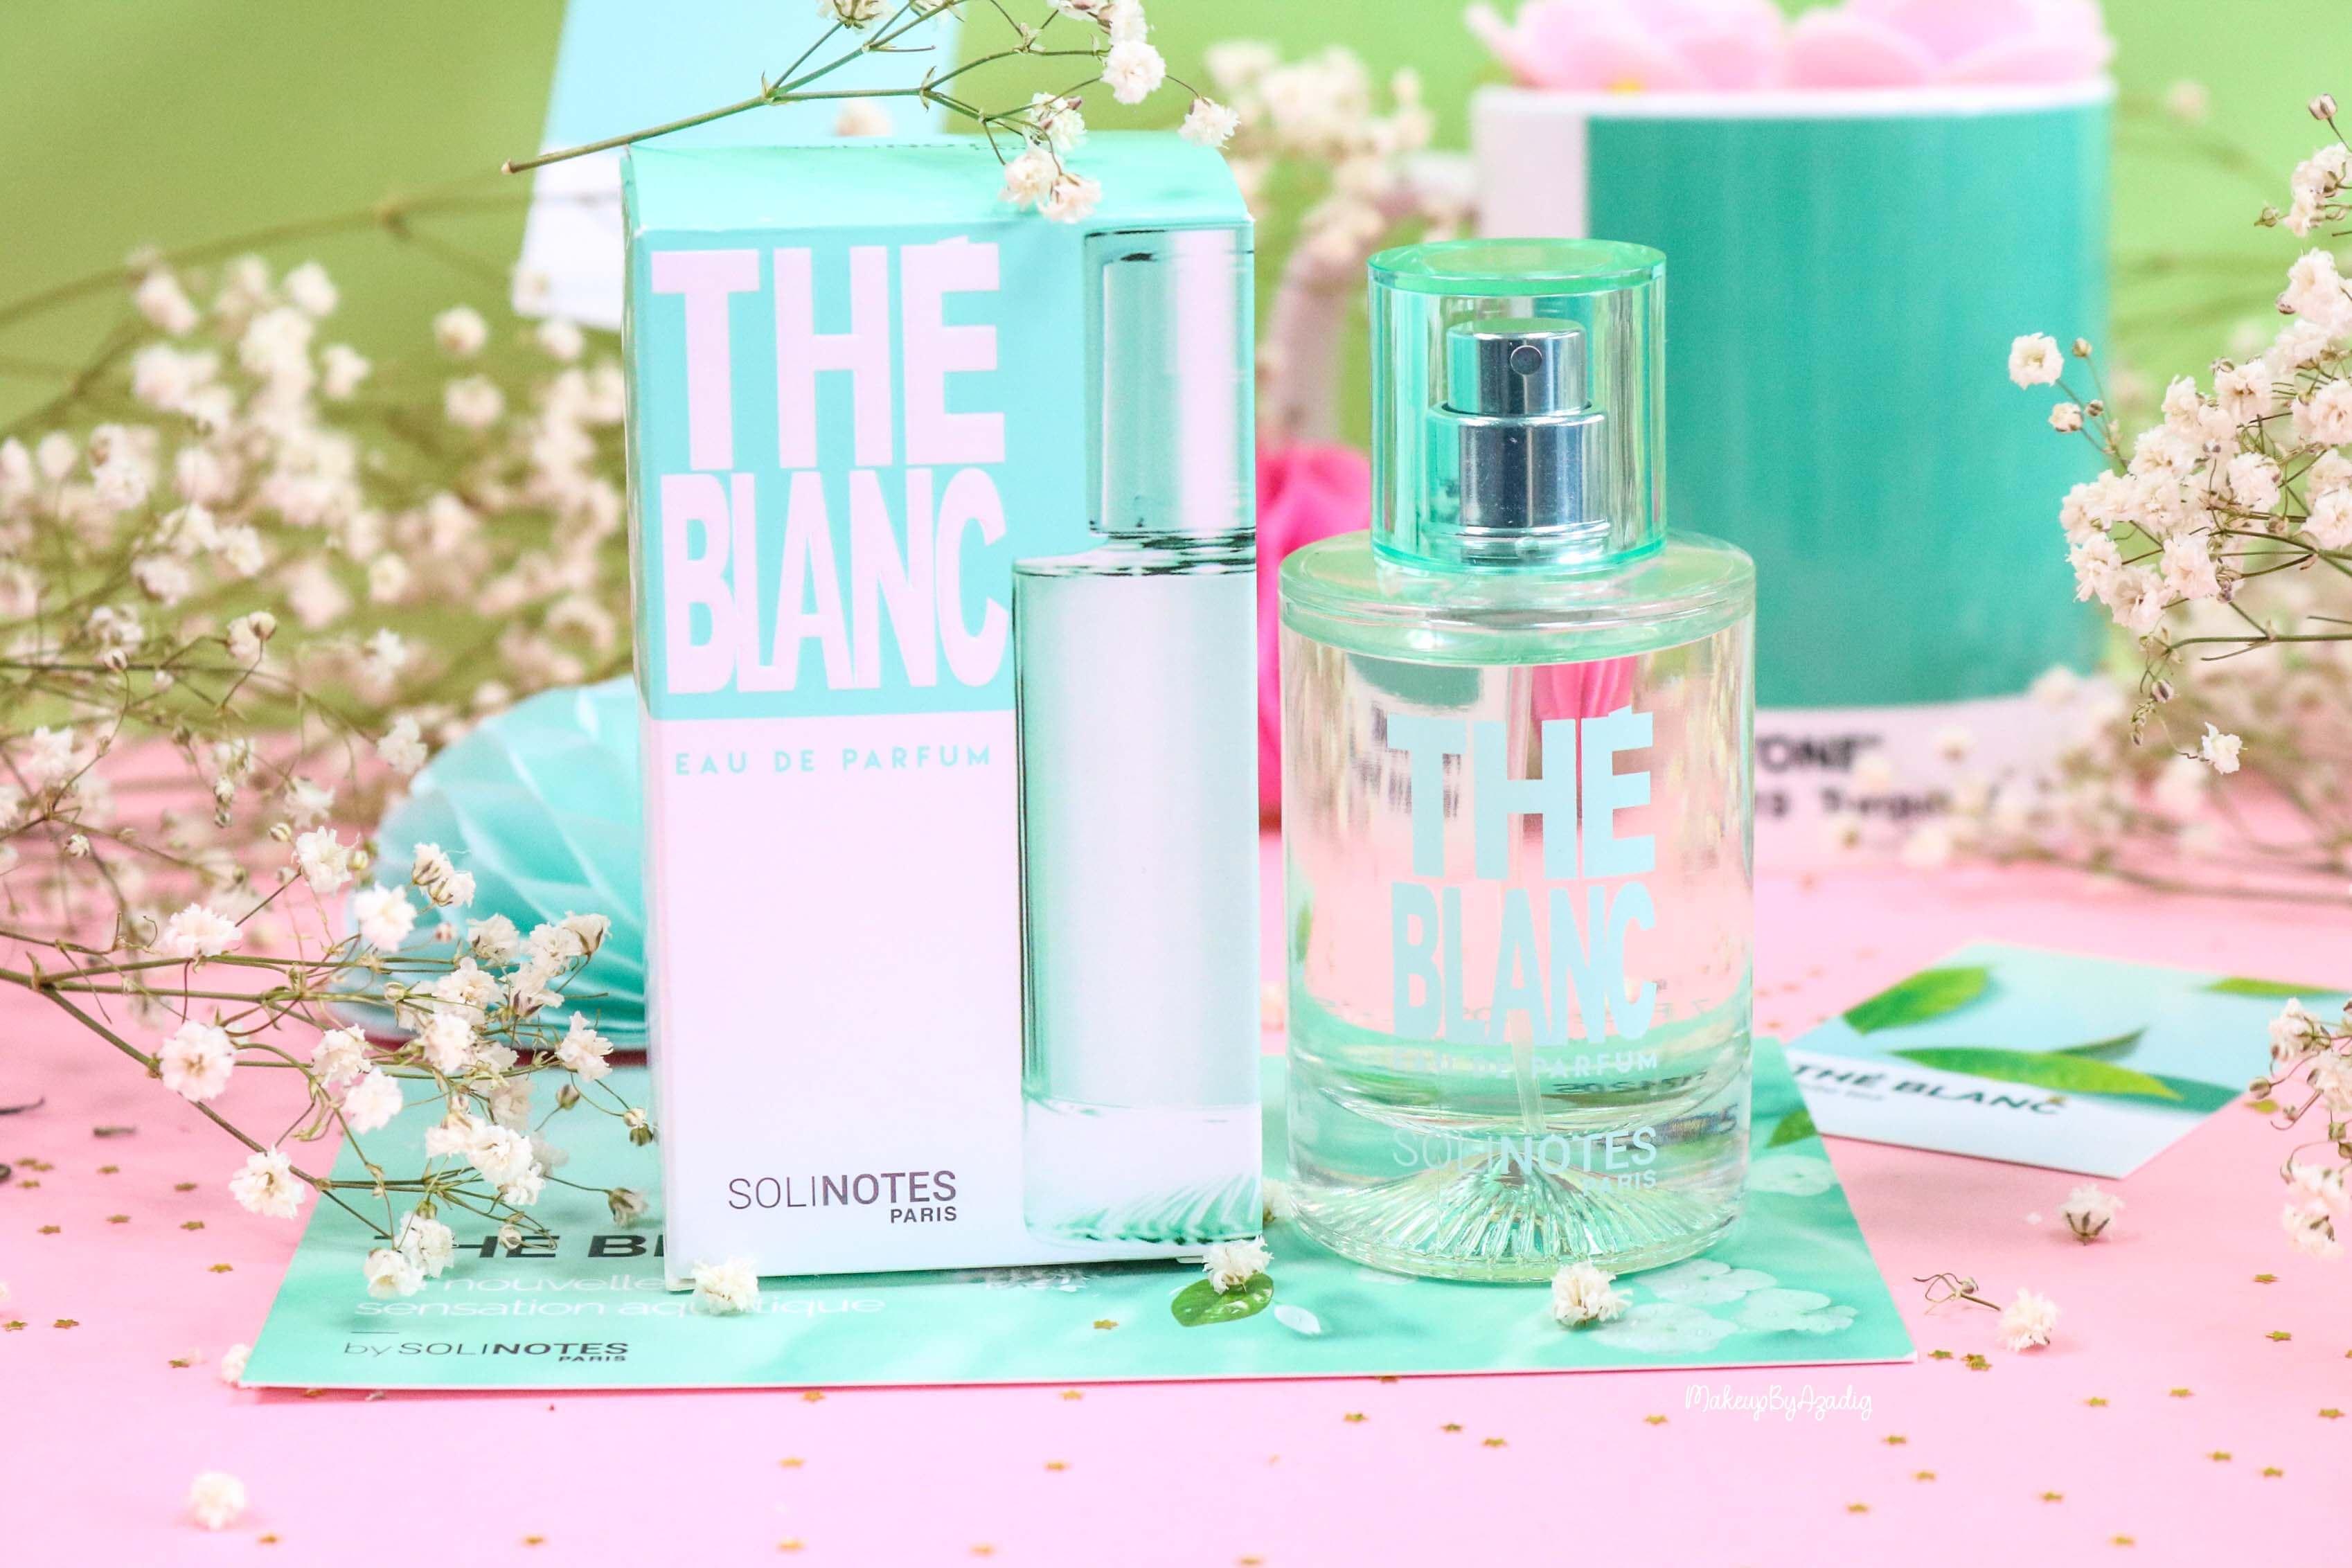 revue-parfum-solinotes-sephora-monoprix-the-blanc-vanille-oranger-prix-pas-cher-promo-makeupbyazadig-white